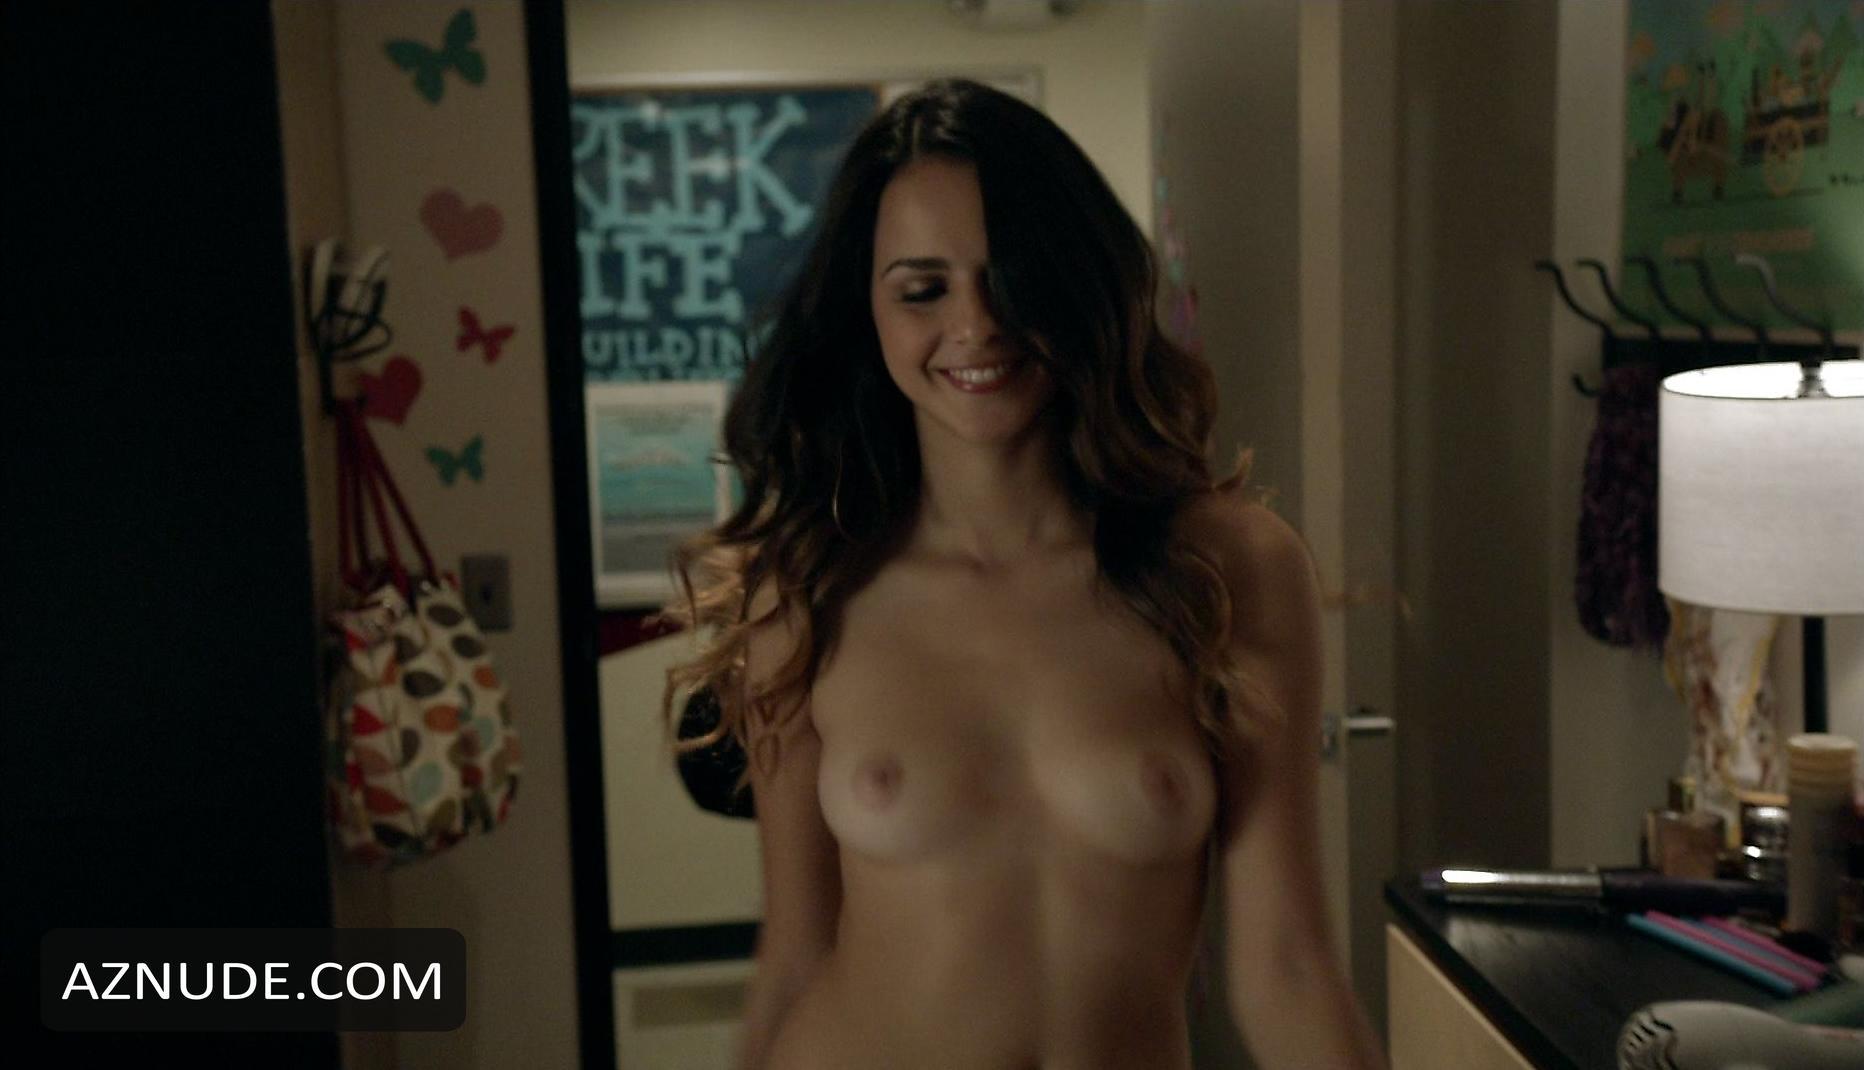 Laura wiggins nude boobs and butt in shameless scandalplanet - 1 part 2